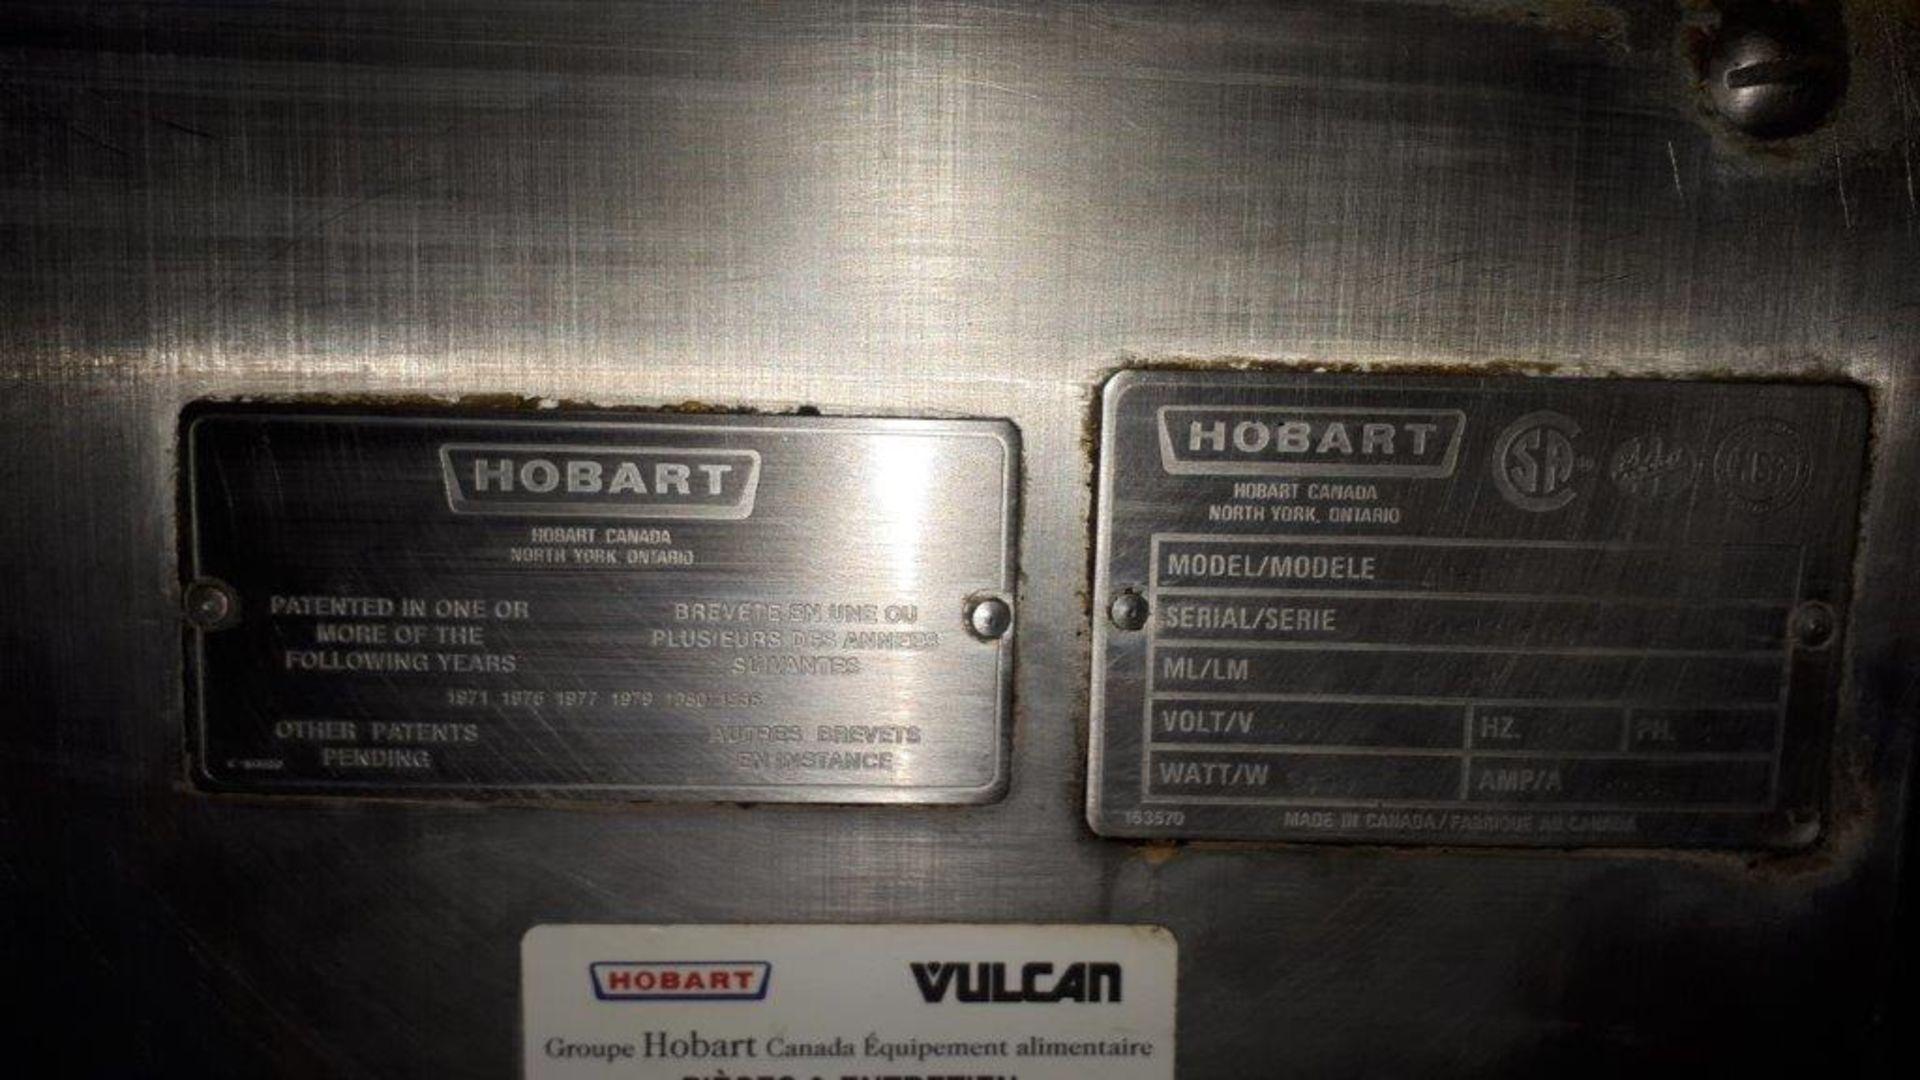 Hobart stainless steel dishwasher, model: AM14 - Image 4 of 7